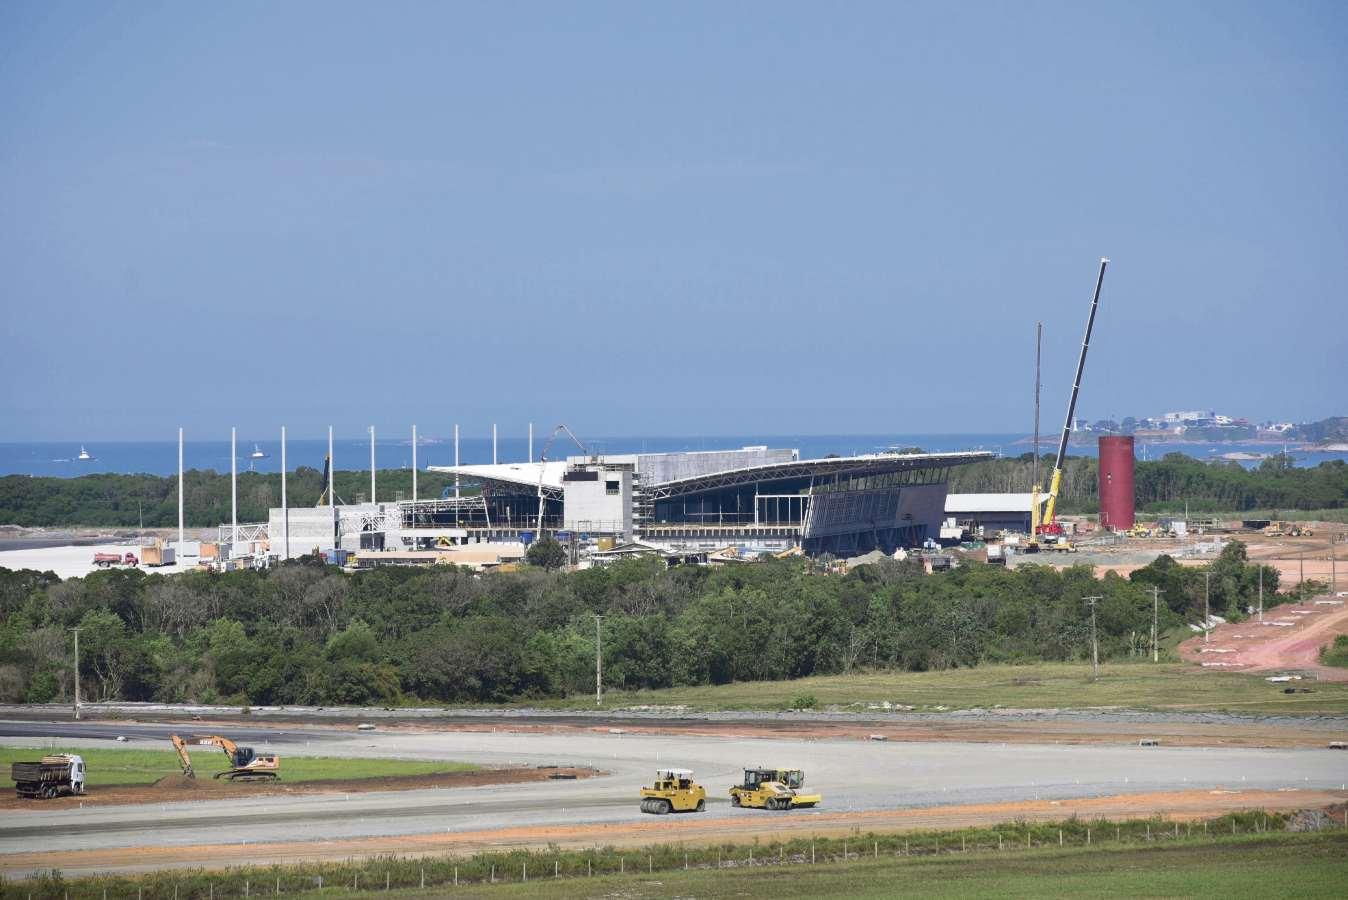 Aeroporto Vix : Governo estuda privatizar aeroporto de vitória economia gazeta